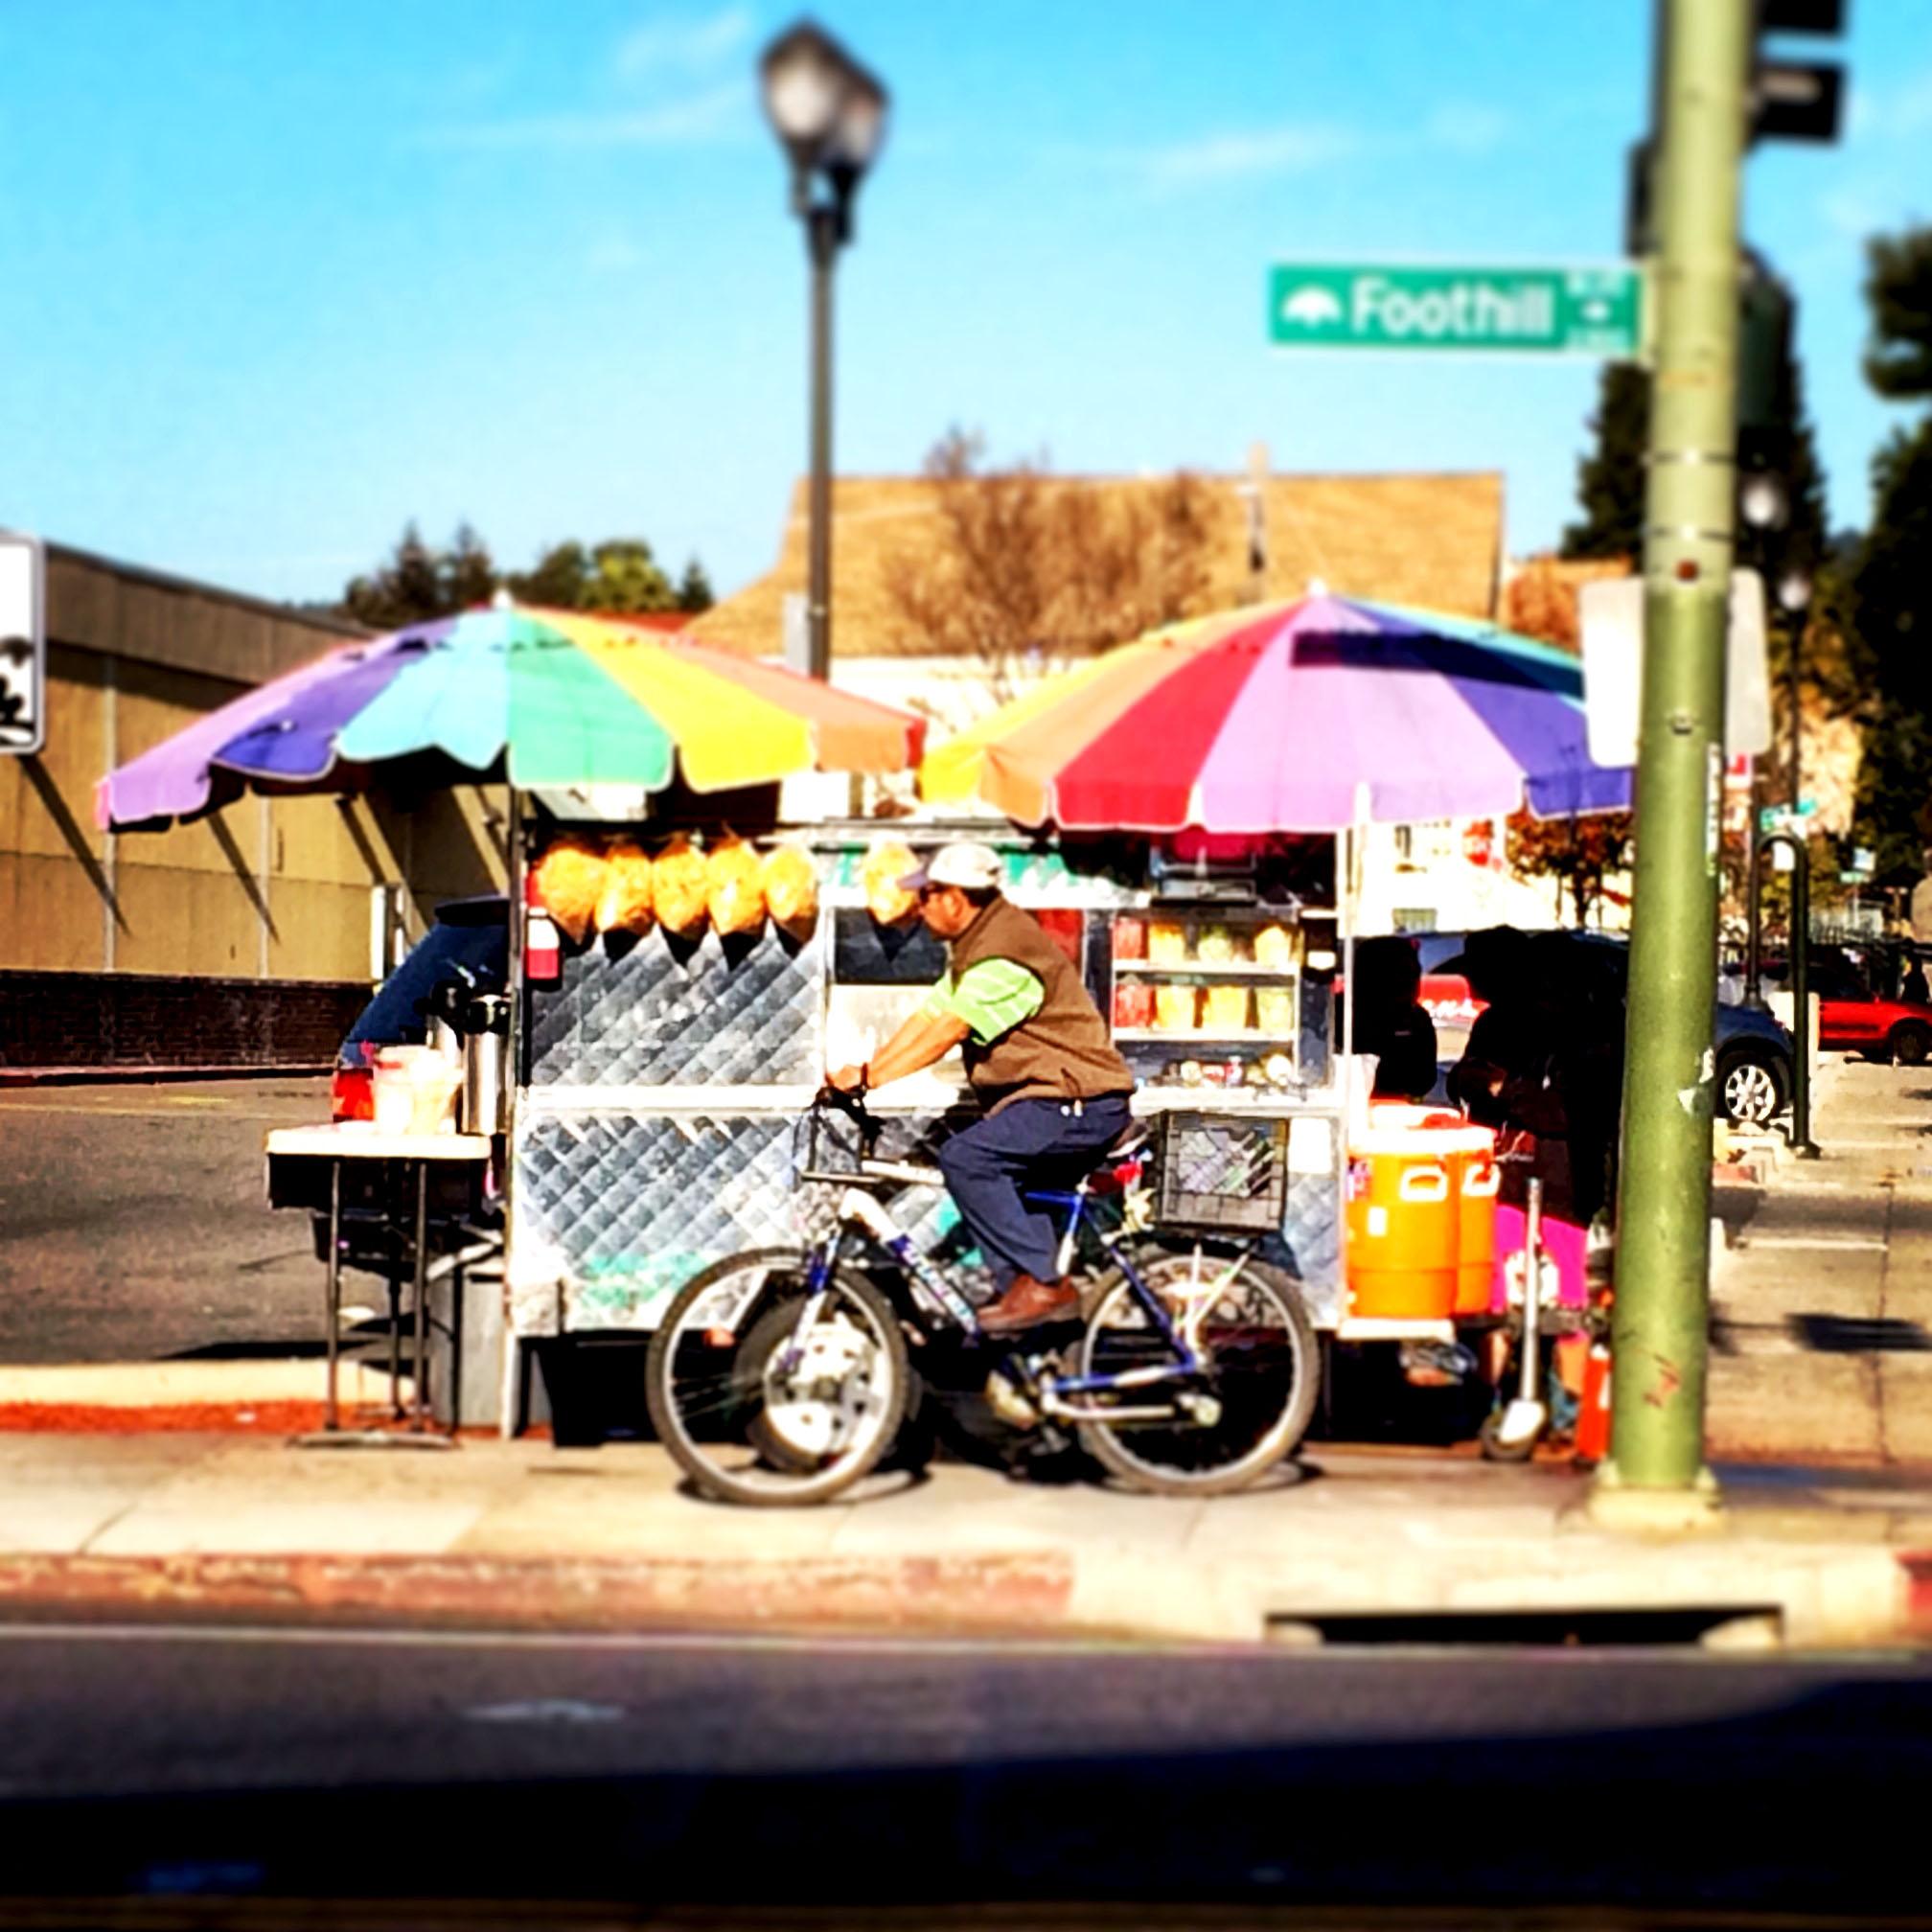 Food Cart, Fruitvale, Oakland, CA